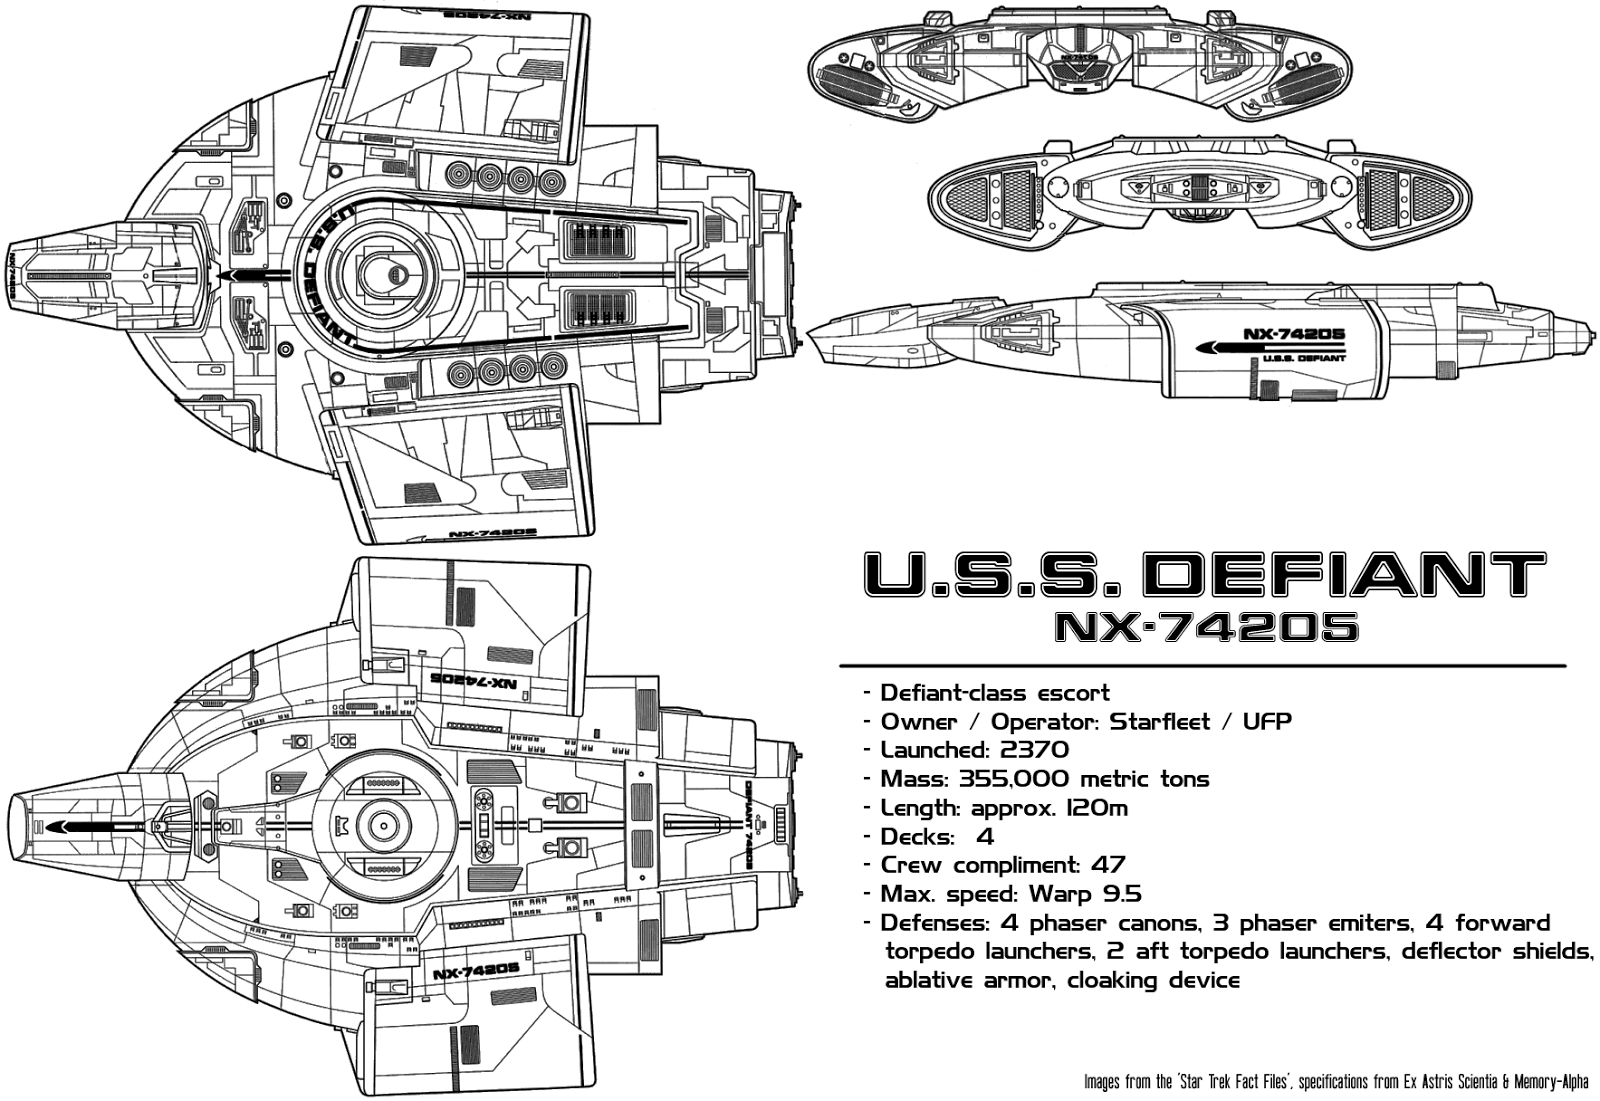 2001 Discovery Spacecraft From Drawing likewise Venture  28ncc 71854 29 also Star Trek Enterprise Class further CmYtZGVtb2R1bGF0b3ItcHJvYmUtc2NoZW1hdGlj as well 348677196124628787. on starship schematics